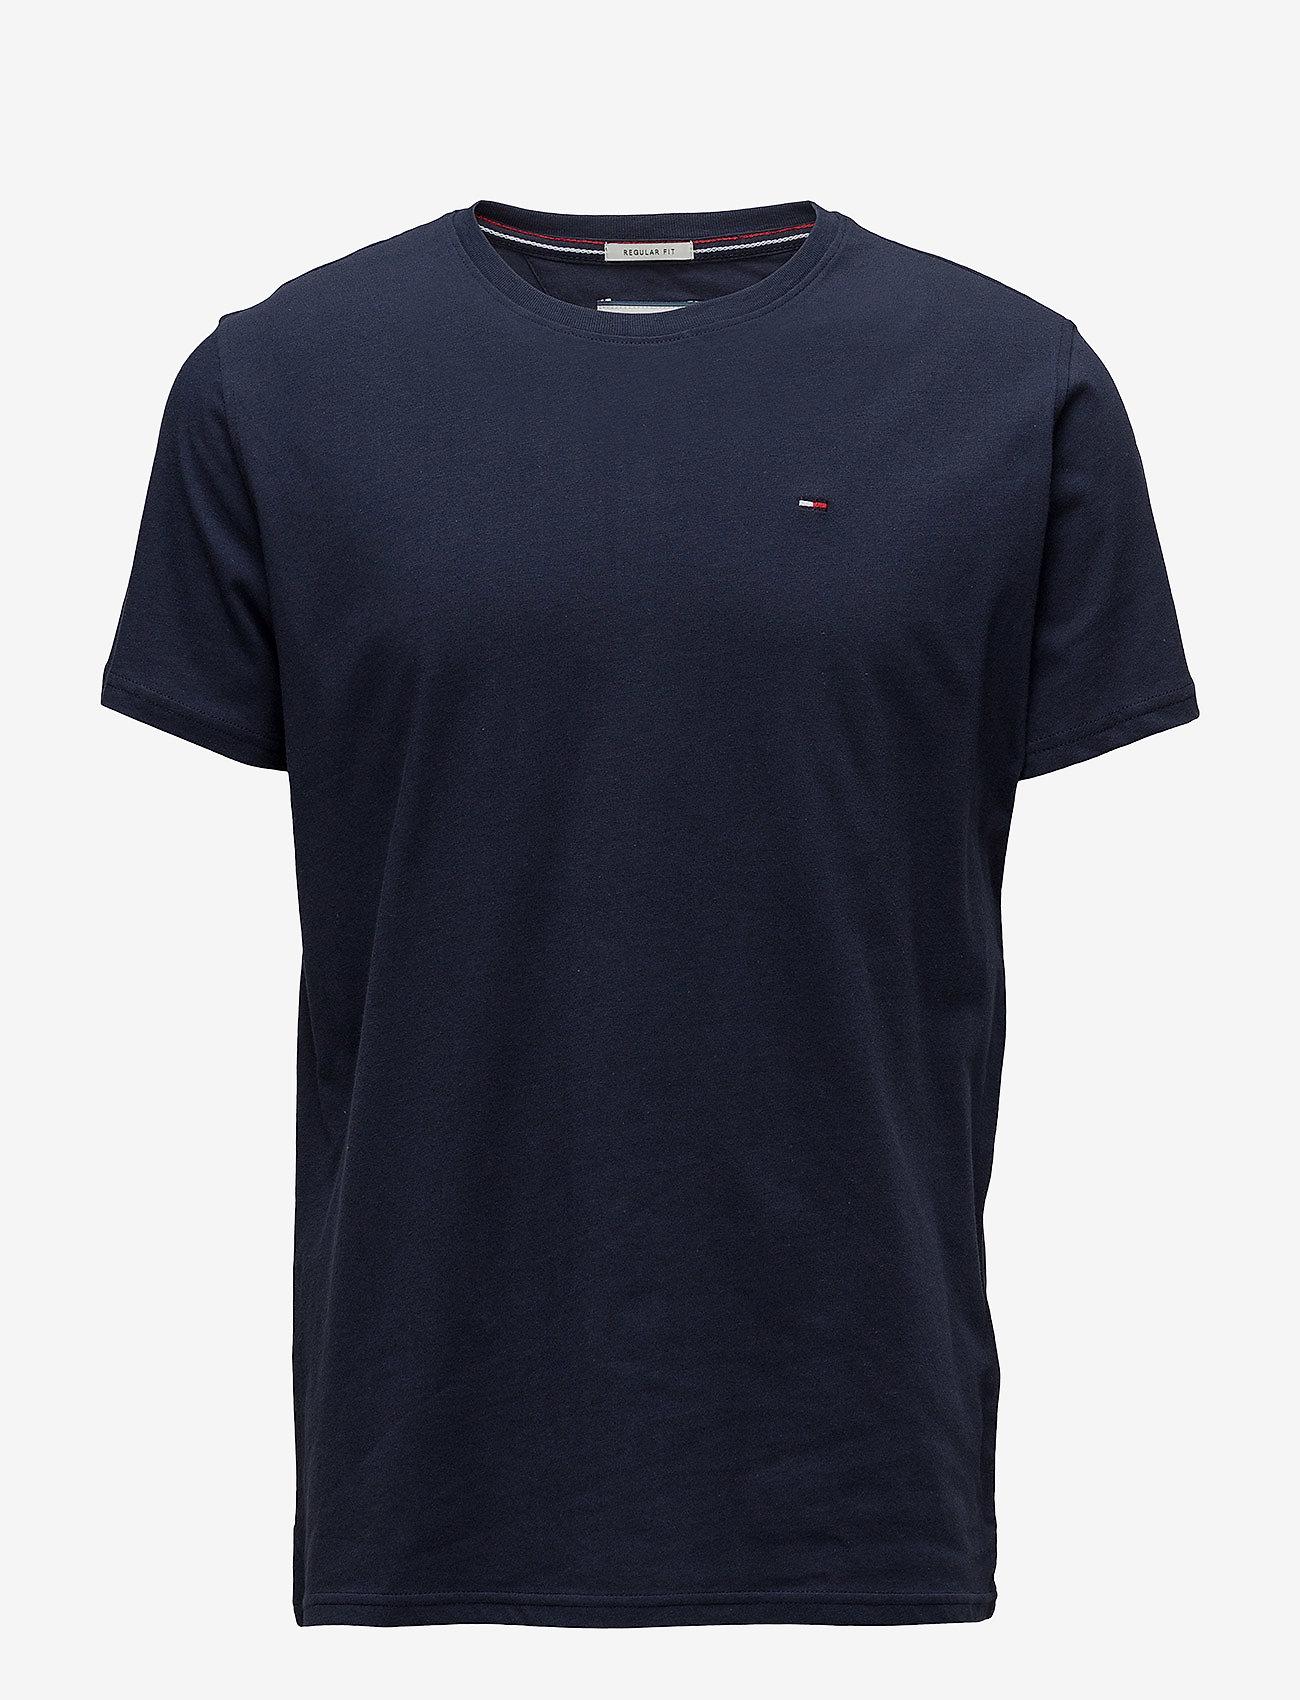 Tommy Jeans - TJM ORIGINAL JERSEY TEE - basic t-shirts - black iris - 0